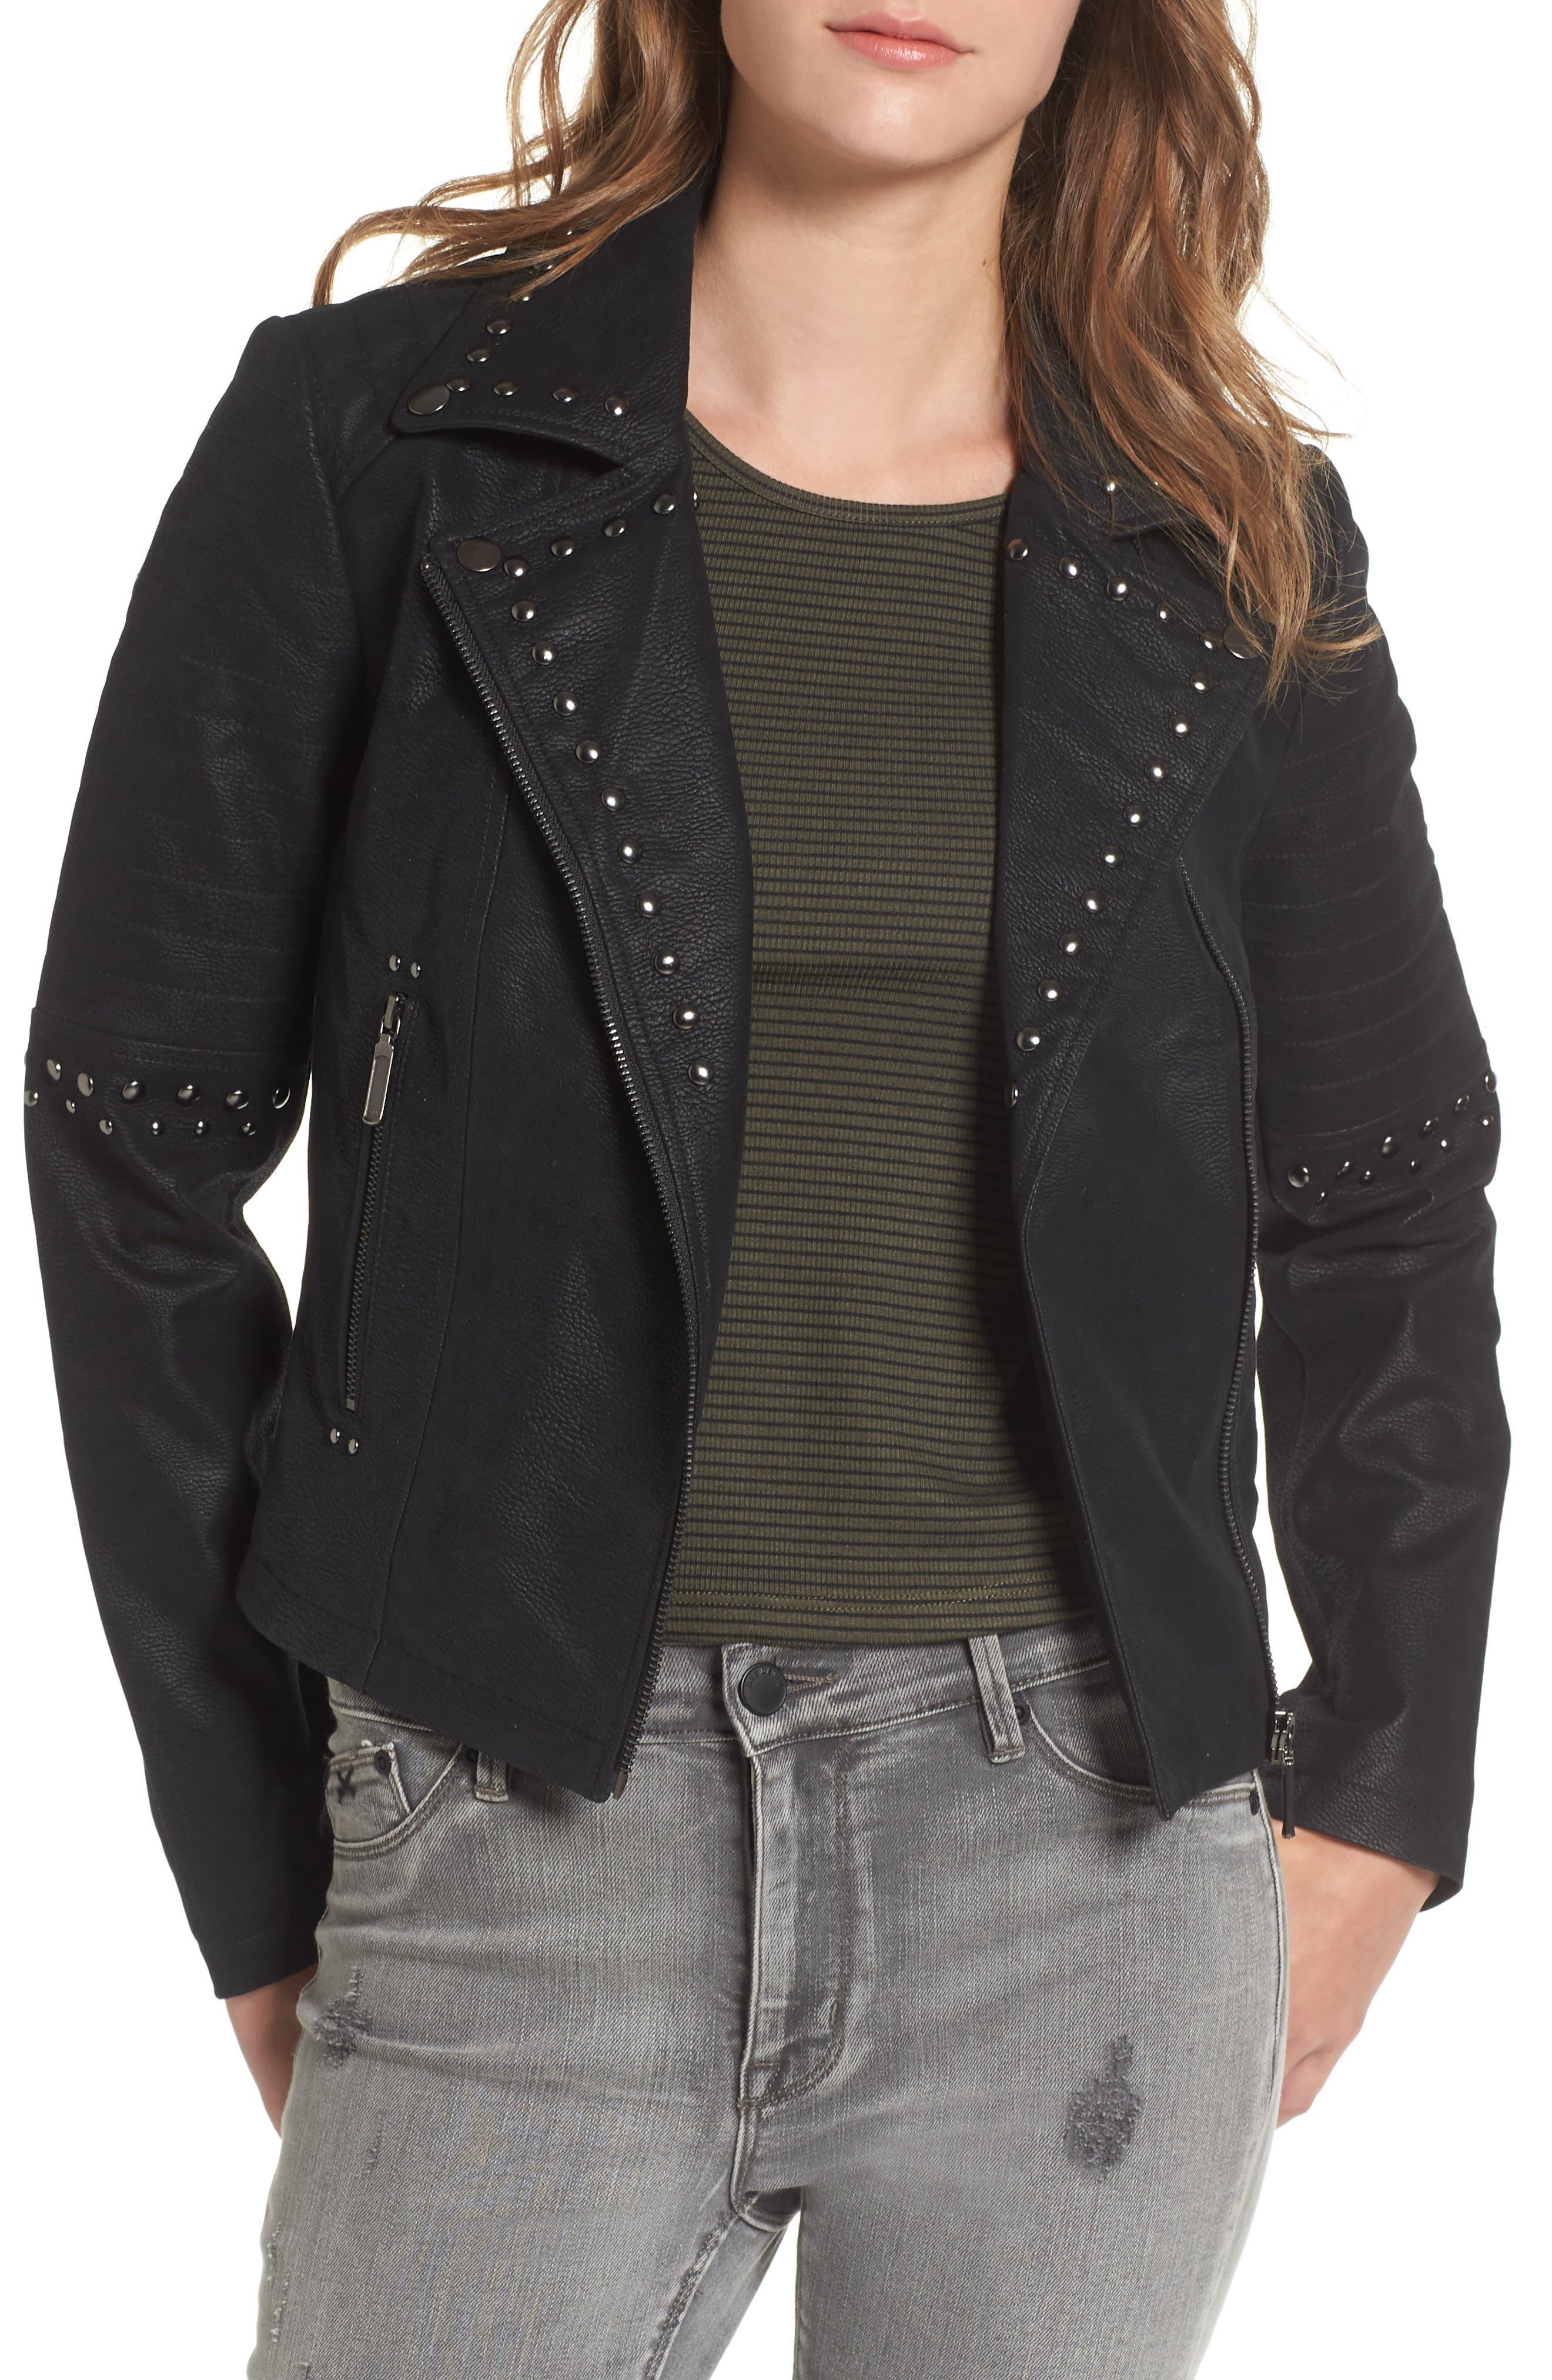 Alternate Image 1 Selected - BP. Studded Faux Leather Moto Jacket